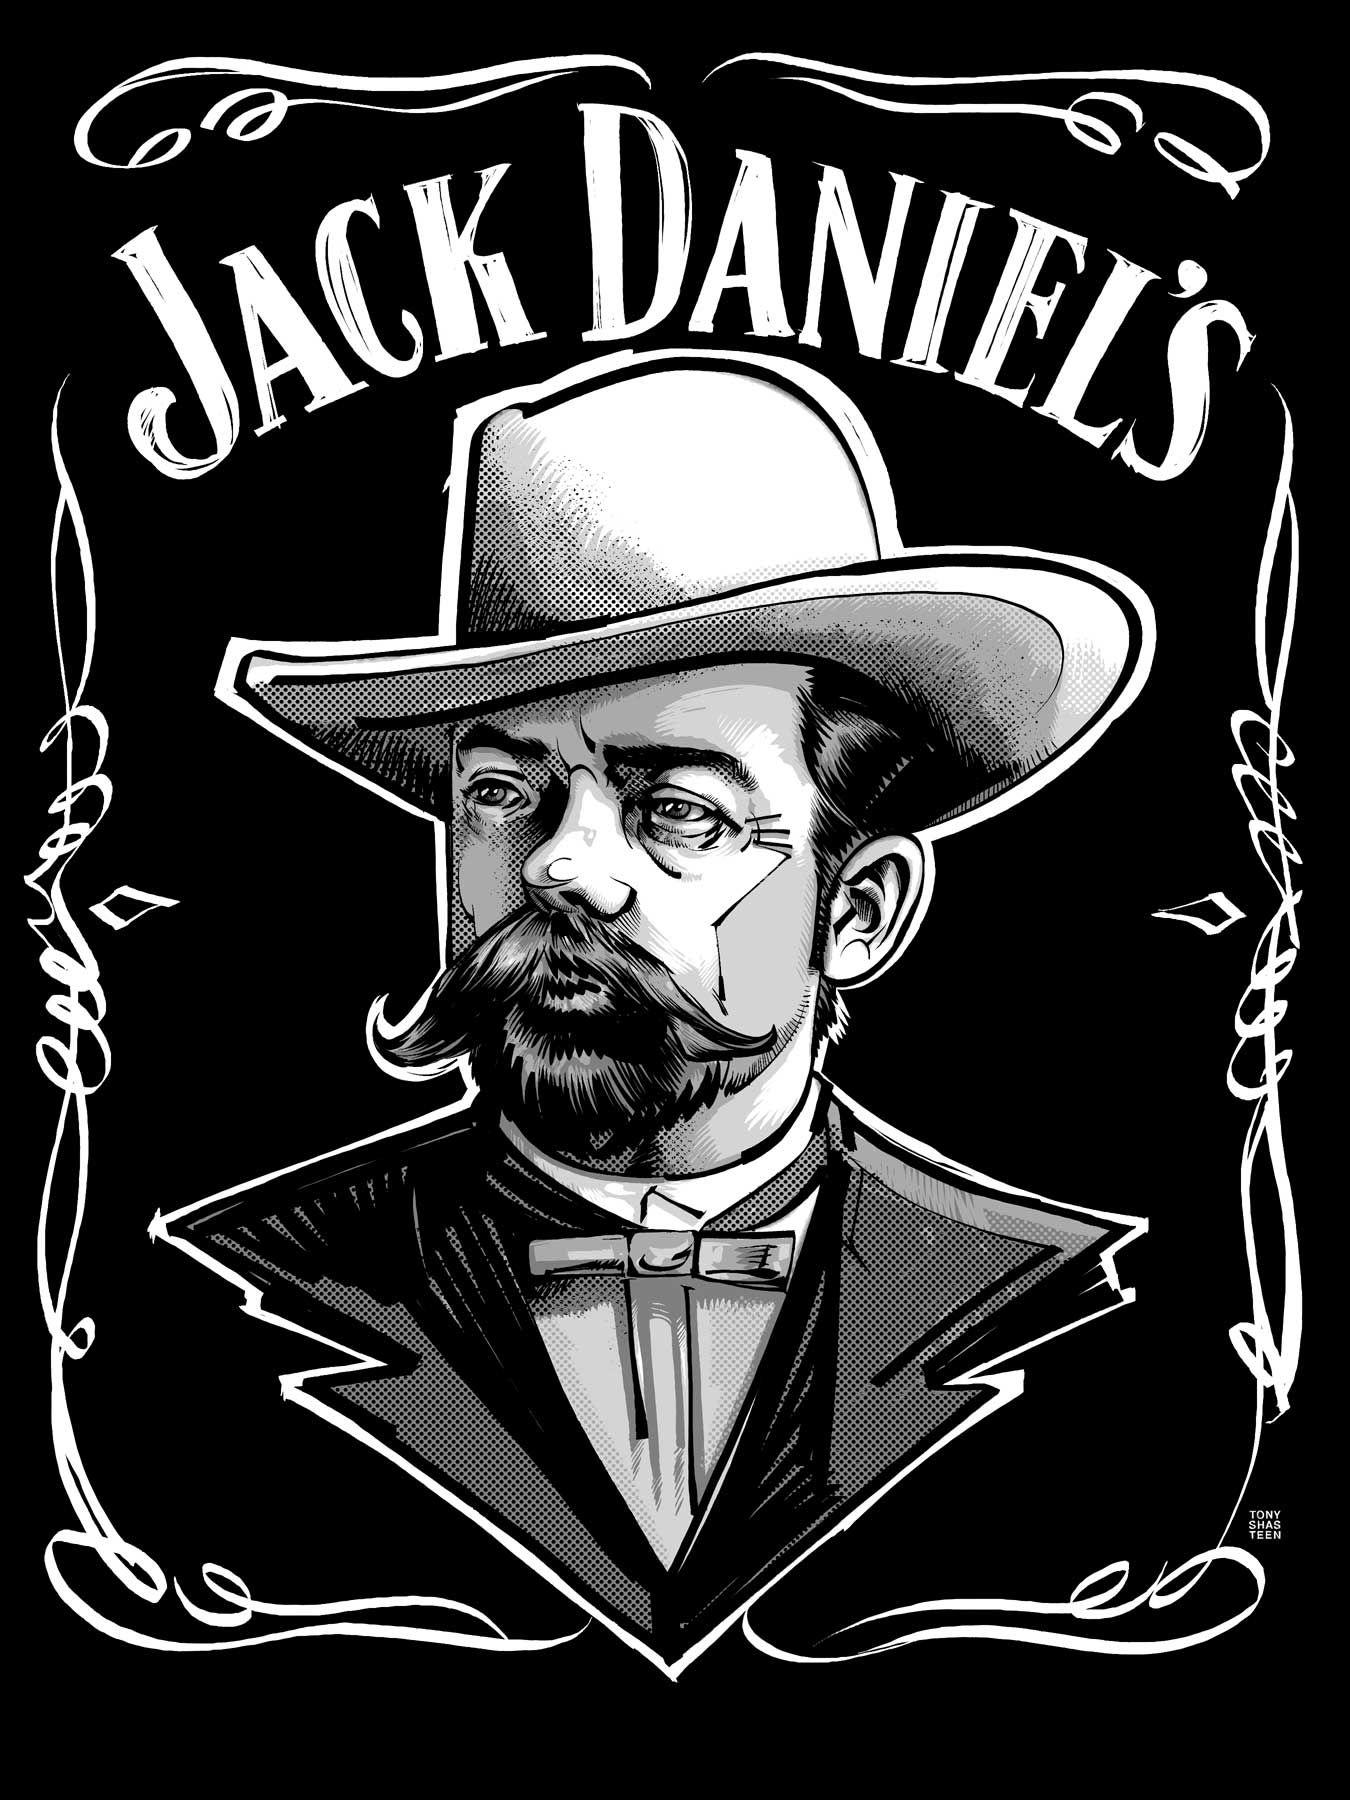 Jack Daniels, more than just a whiskey | Jack daniels ...